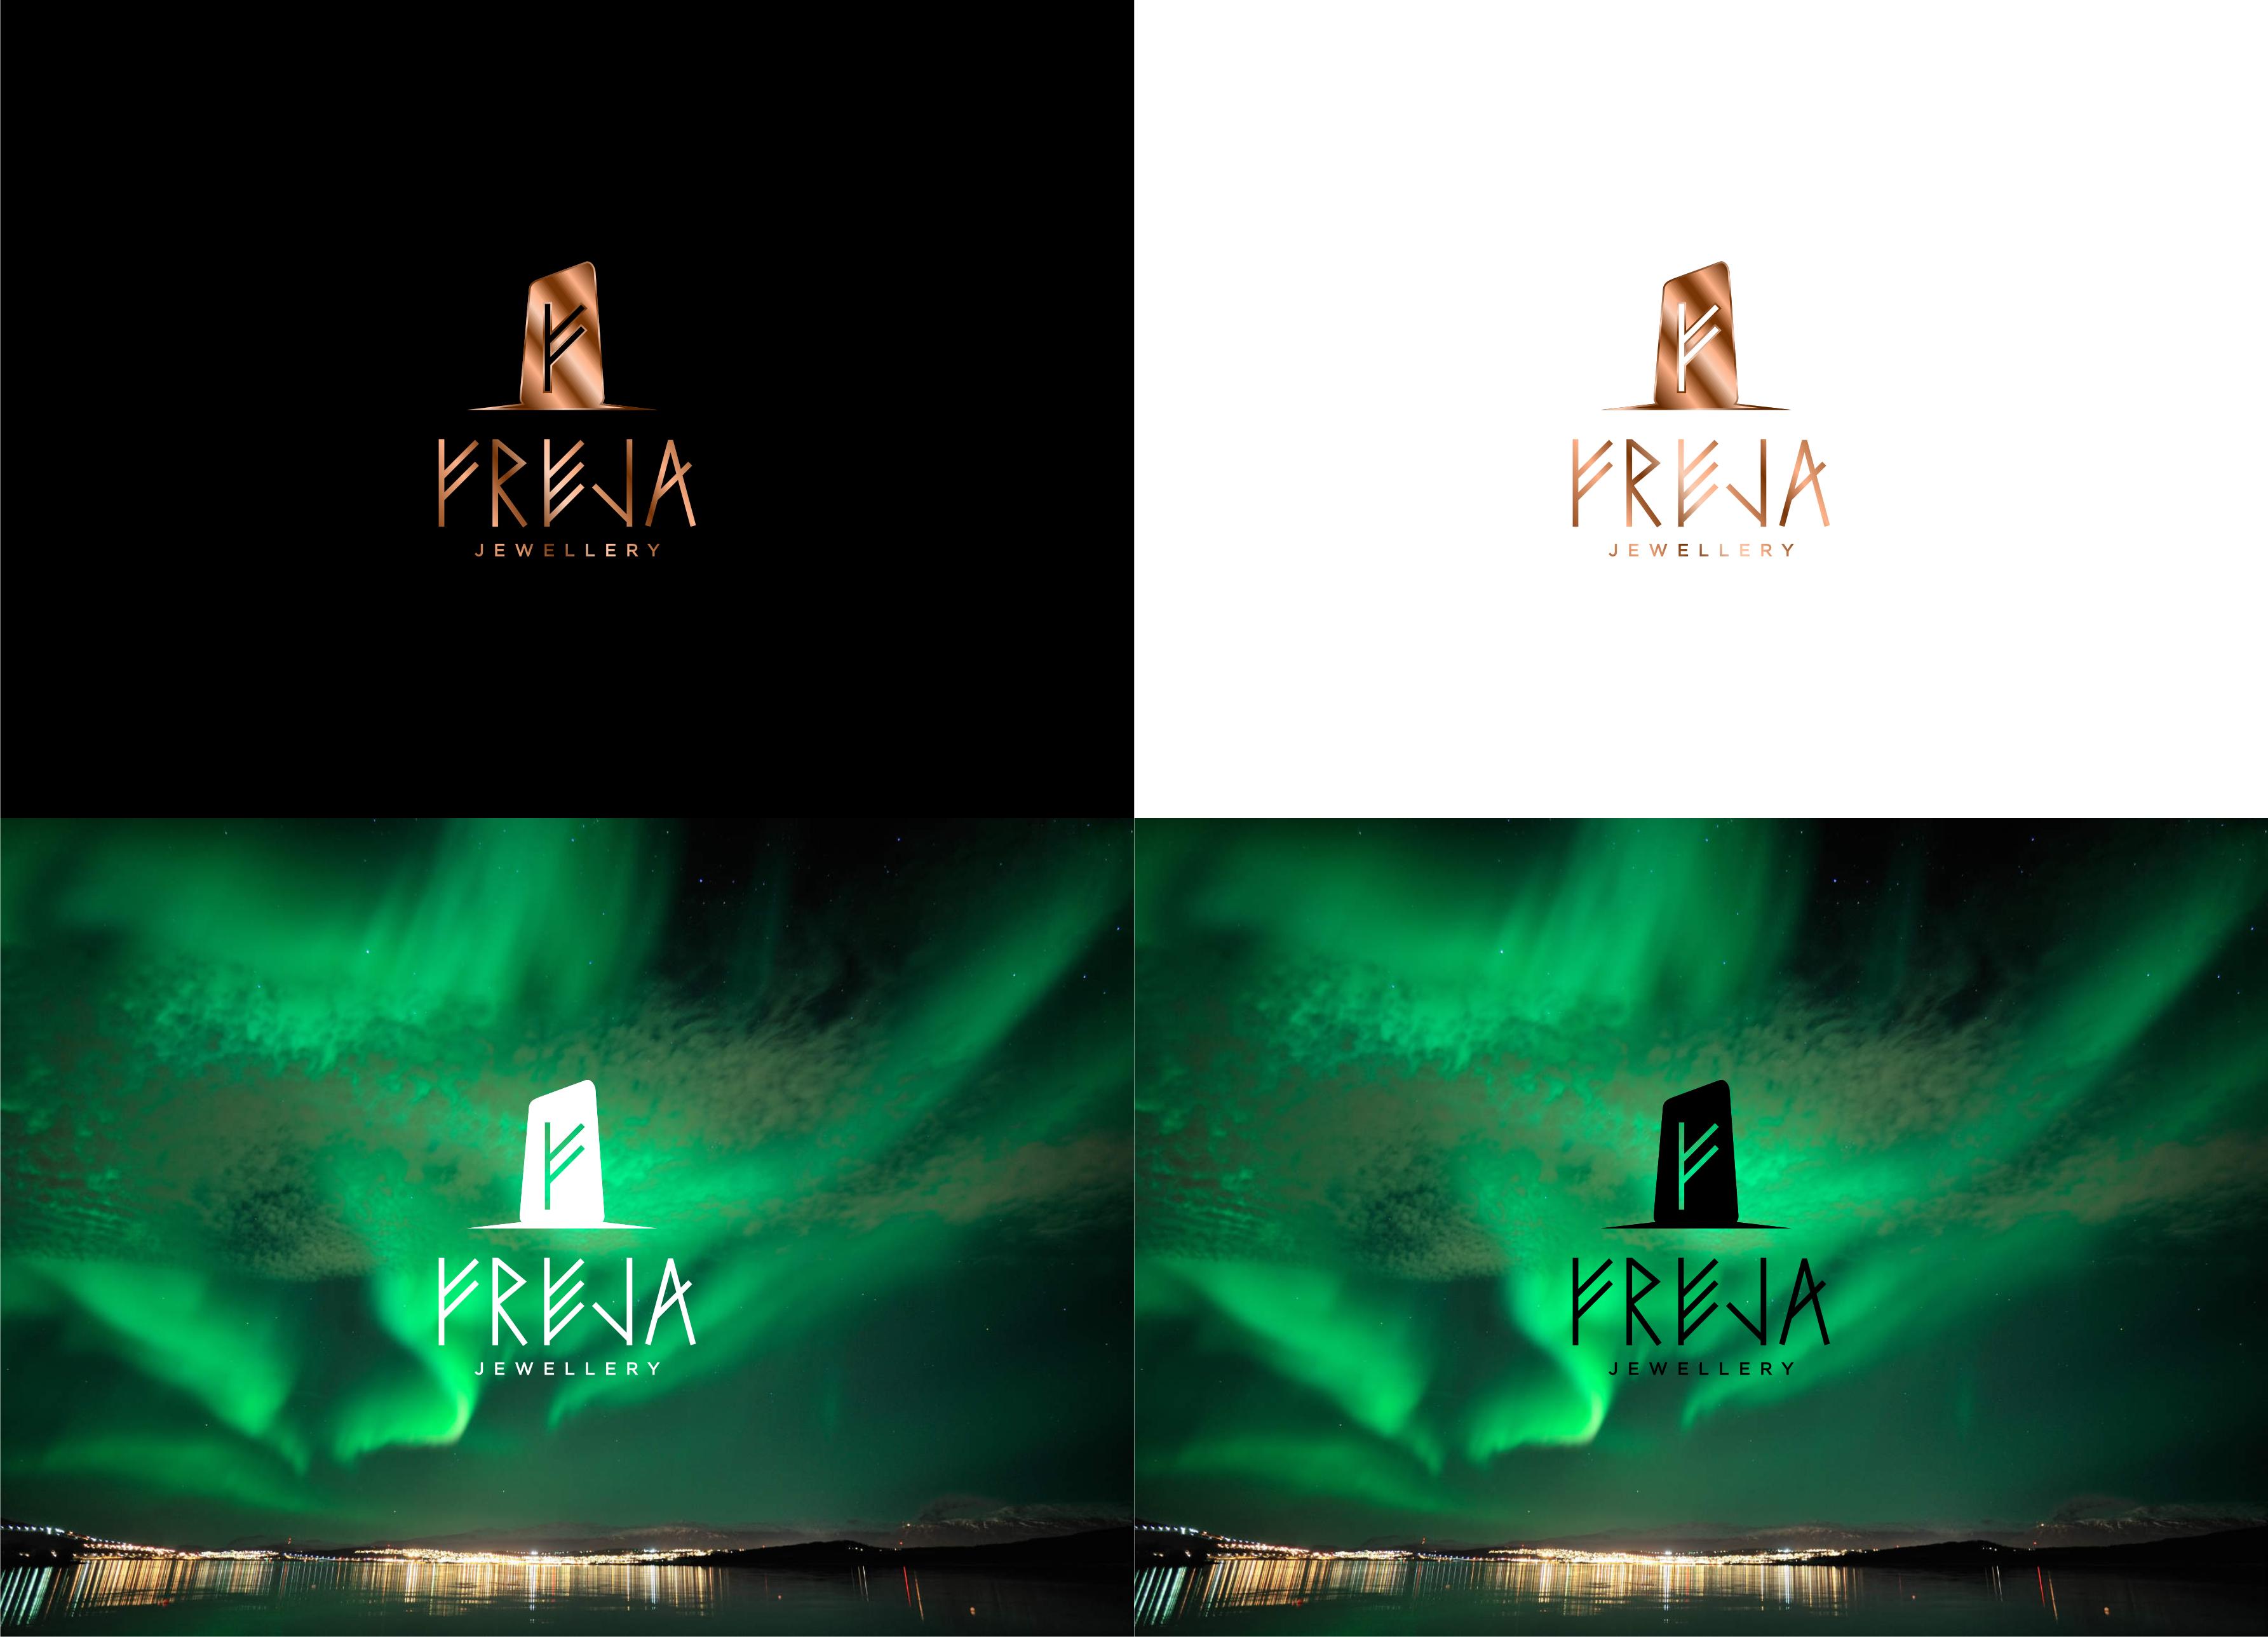 Runestone logo for recycled jewellery